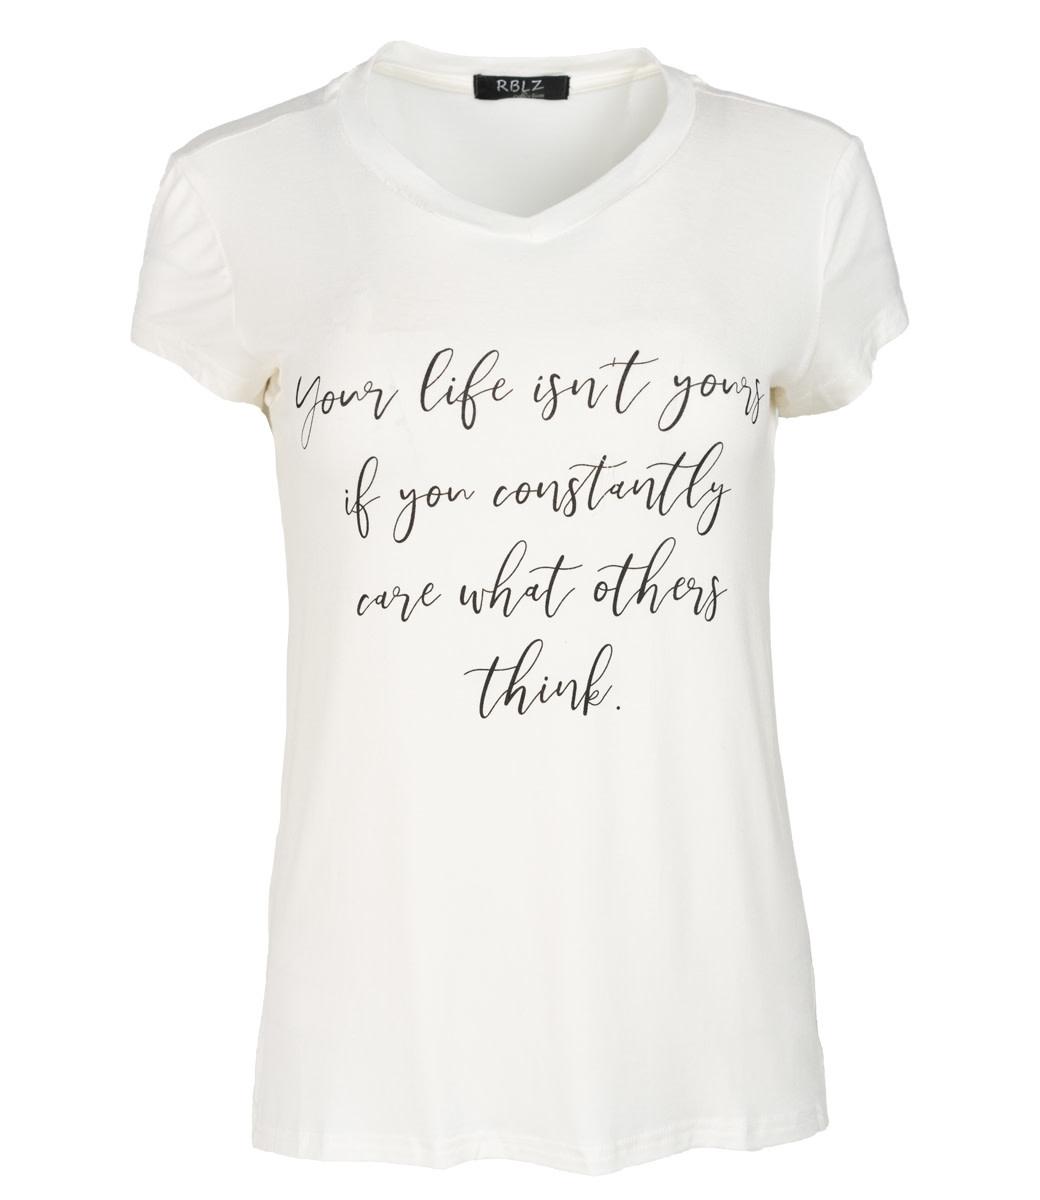 Rebelz Collection Shirt wit/zwart Mandy